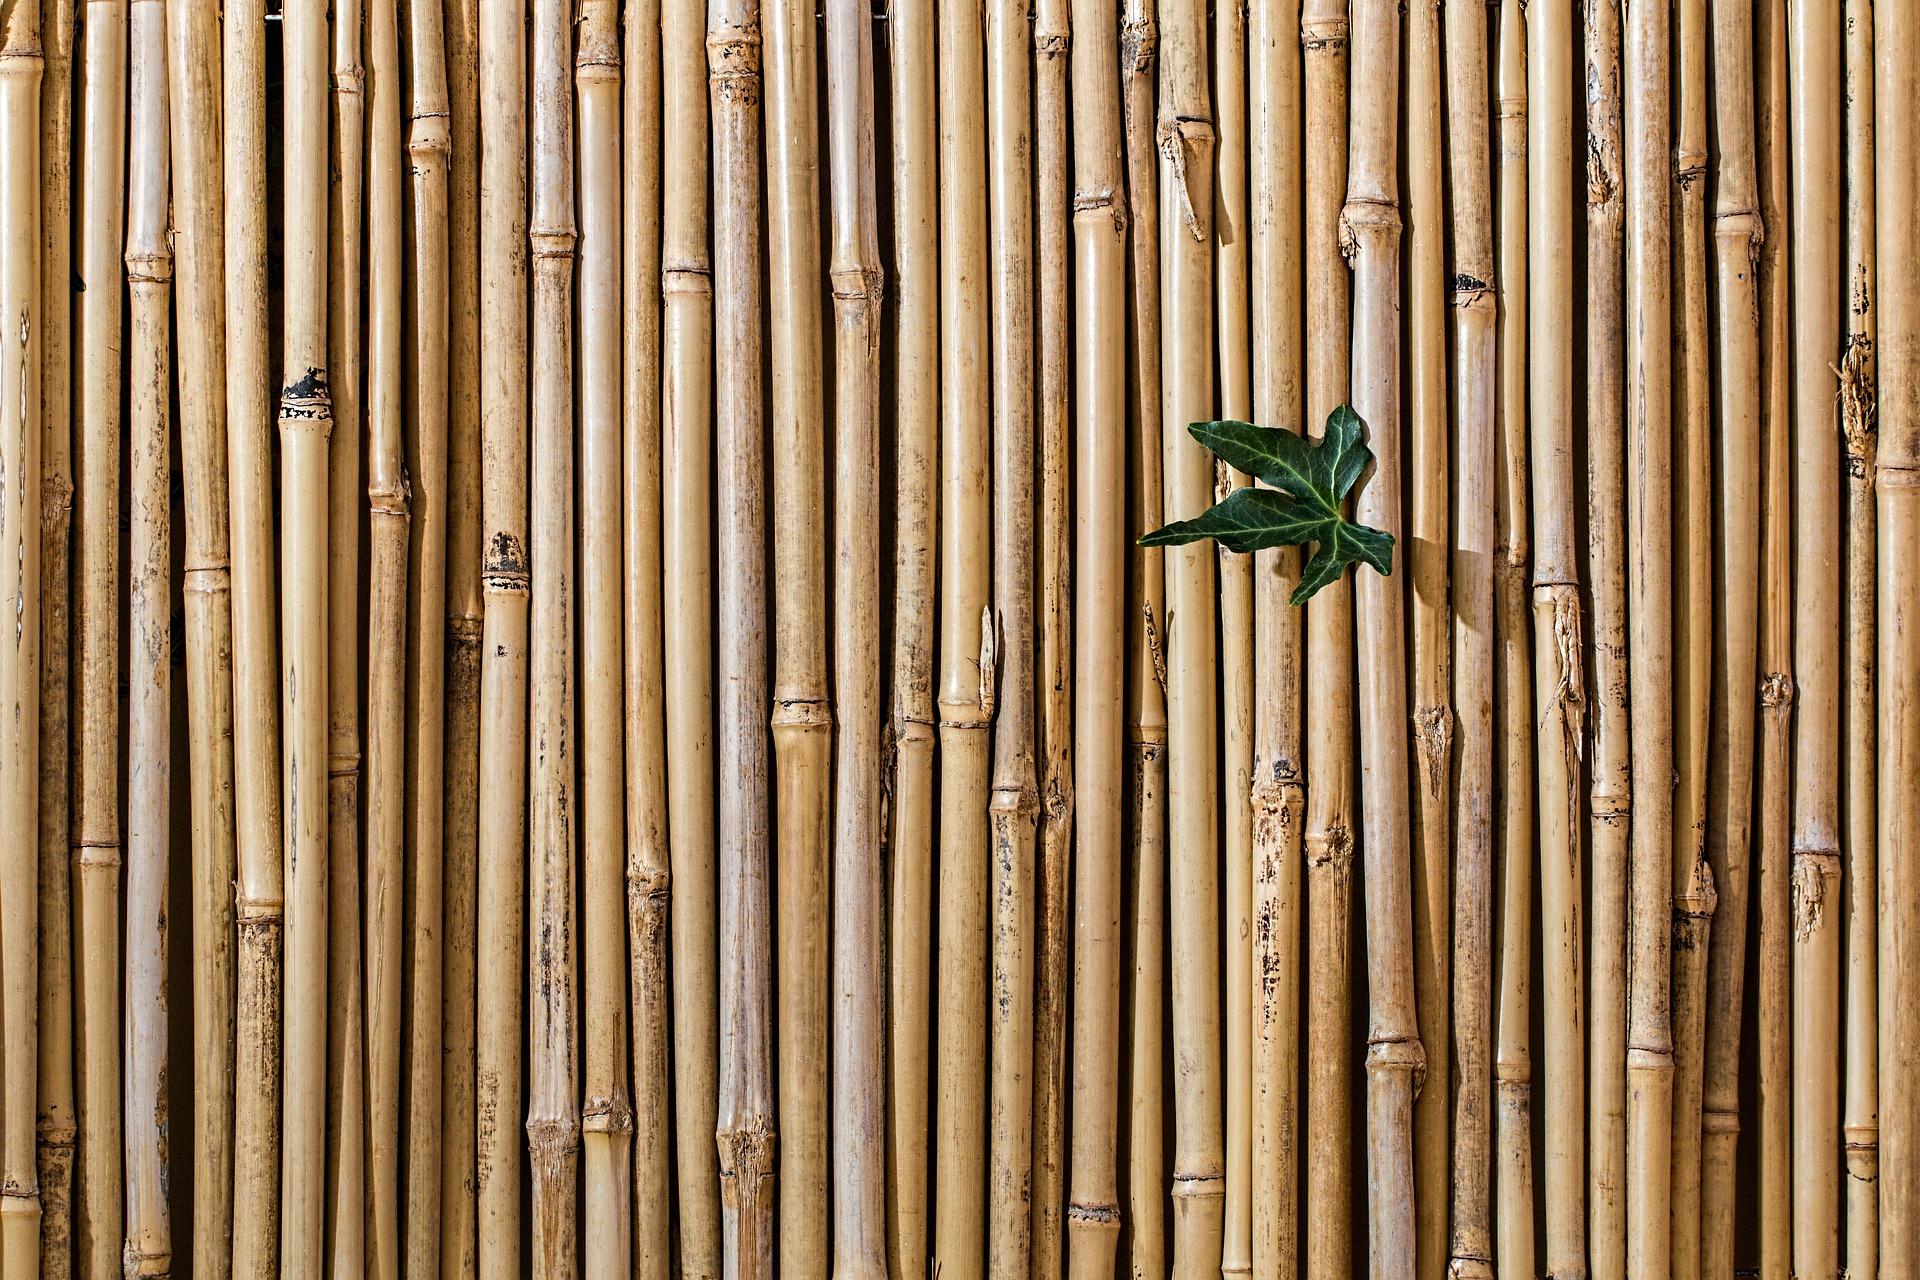 bamboo-2429954_1920.jpg